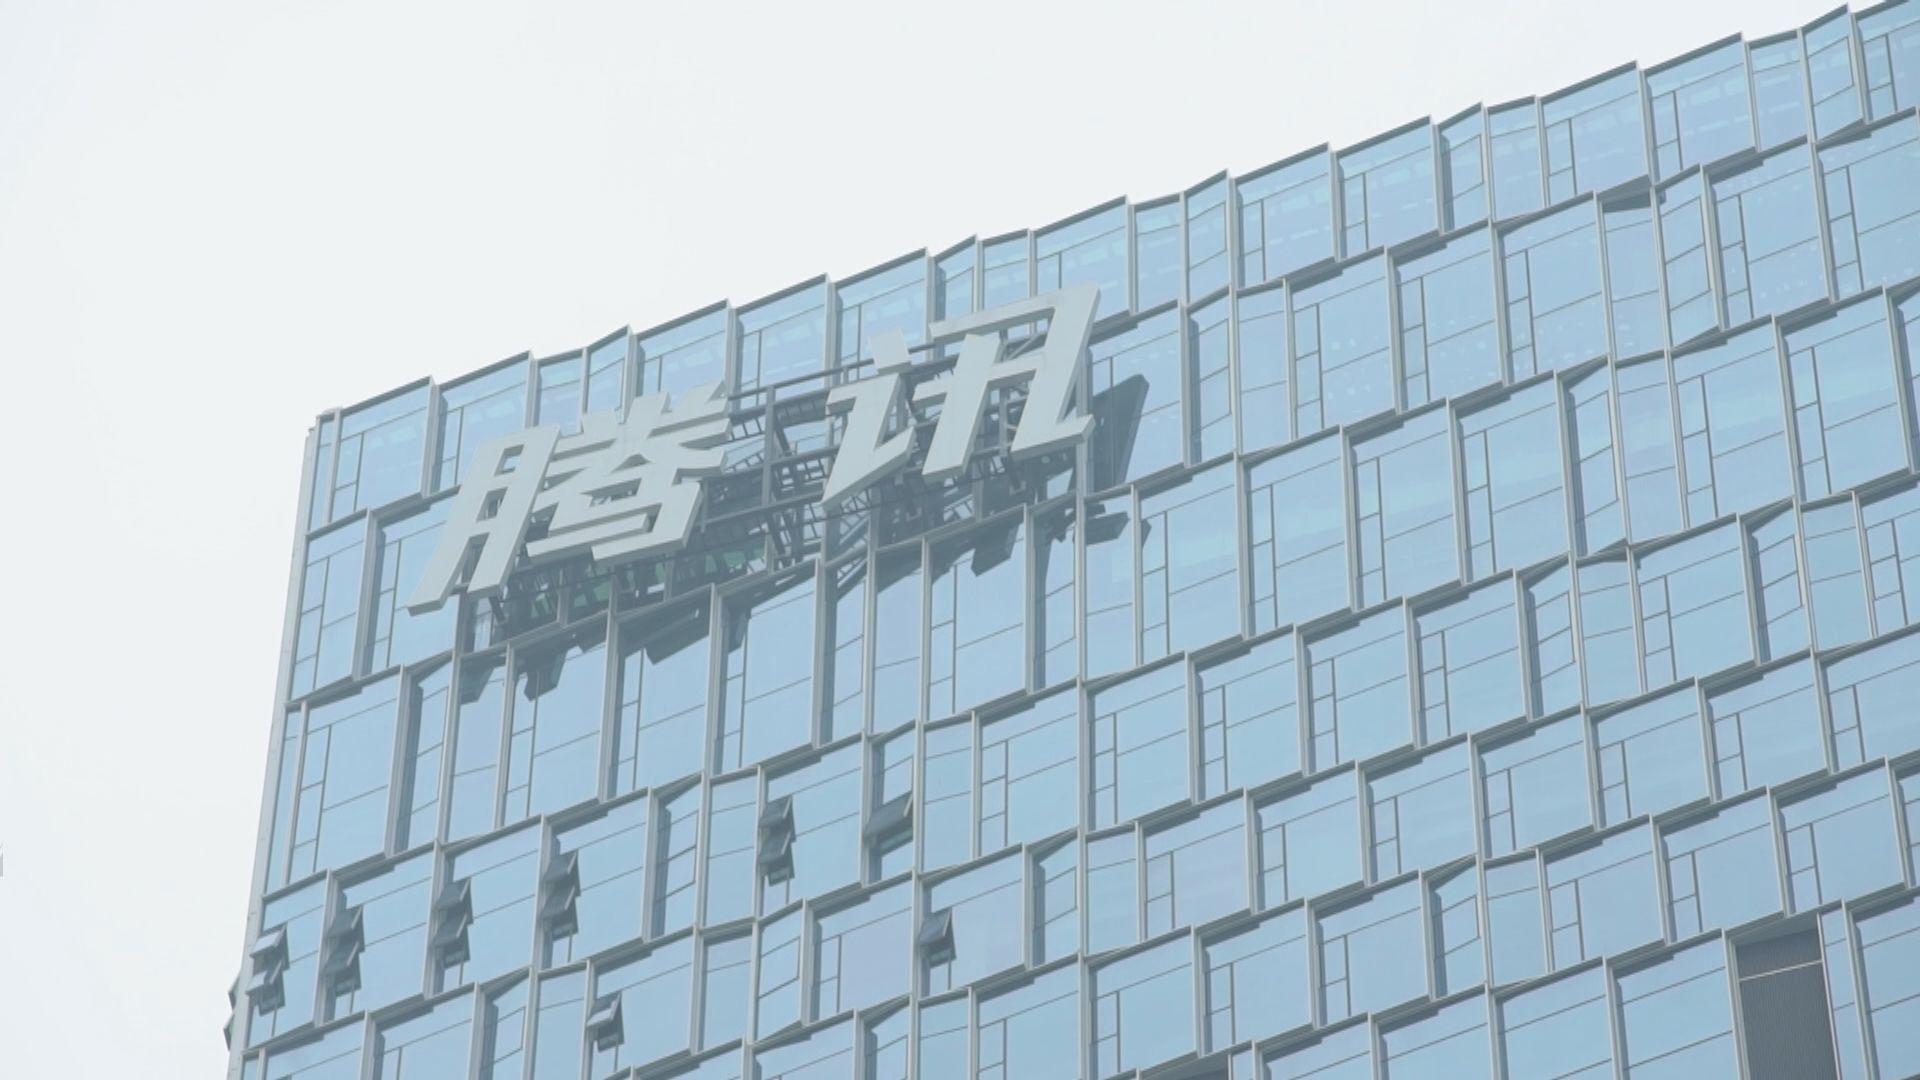 【QQ歐遊】騰訊擬明年歐洲投資逾100億美元